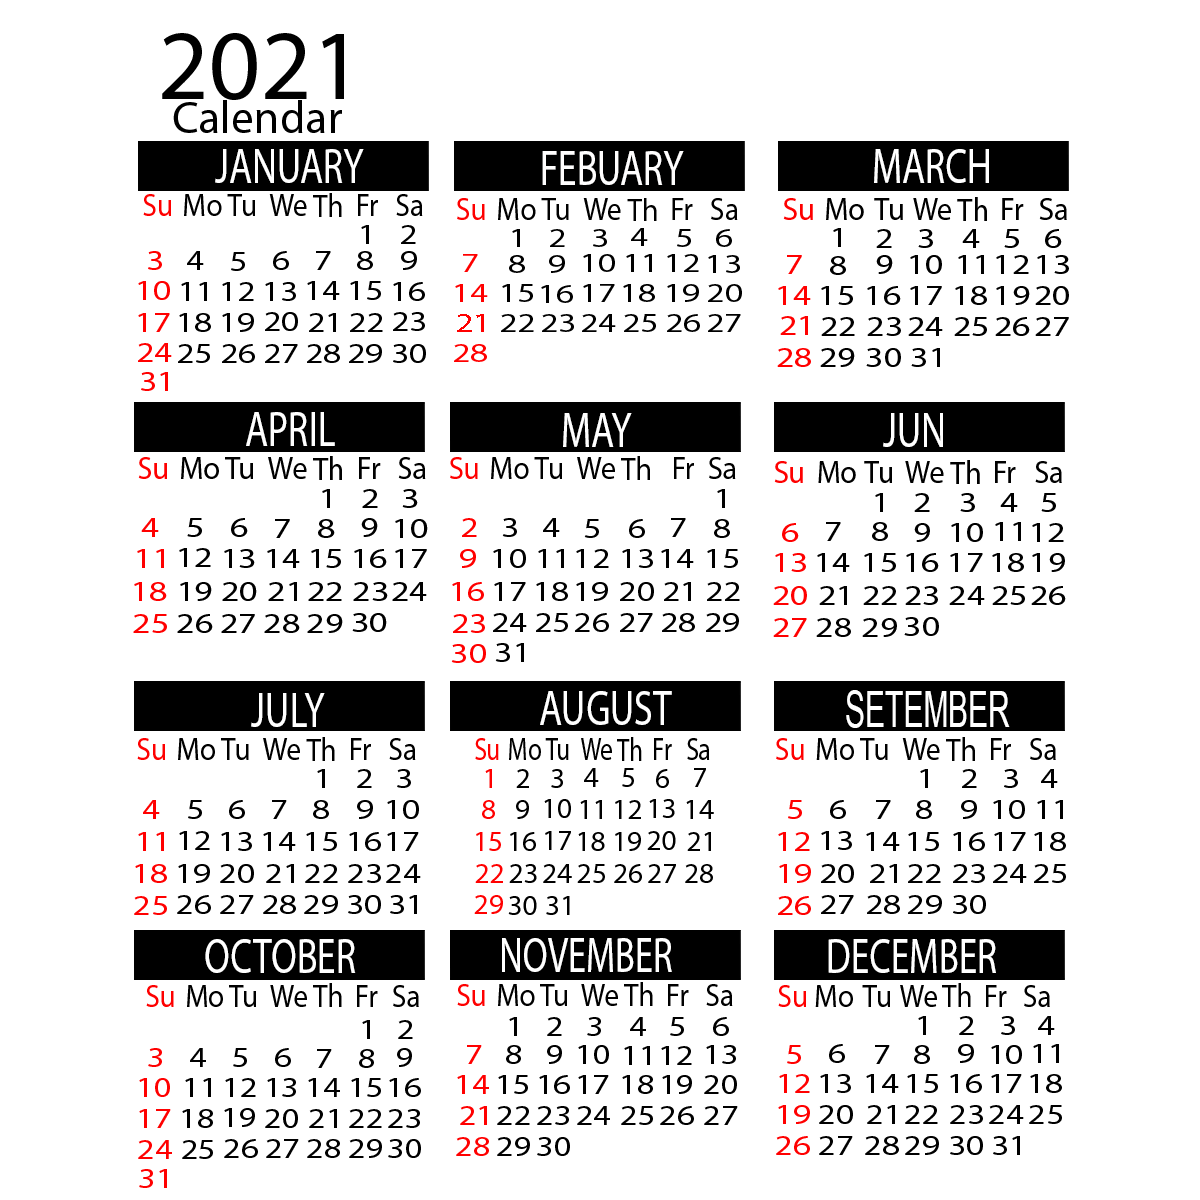 2021 Yearly Calendar Printable Calendar 2021 in 2020